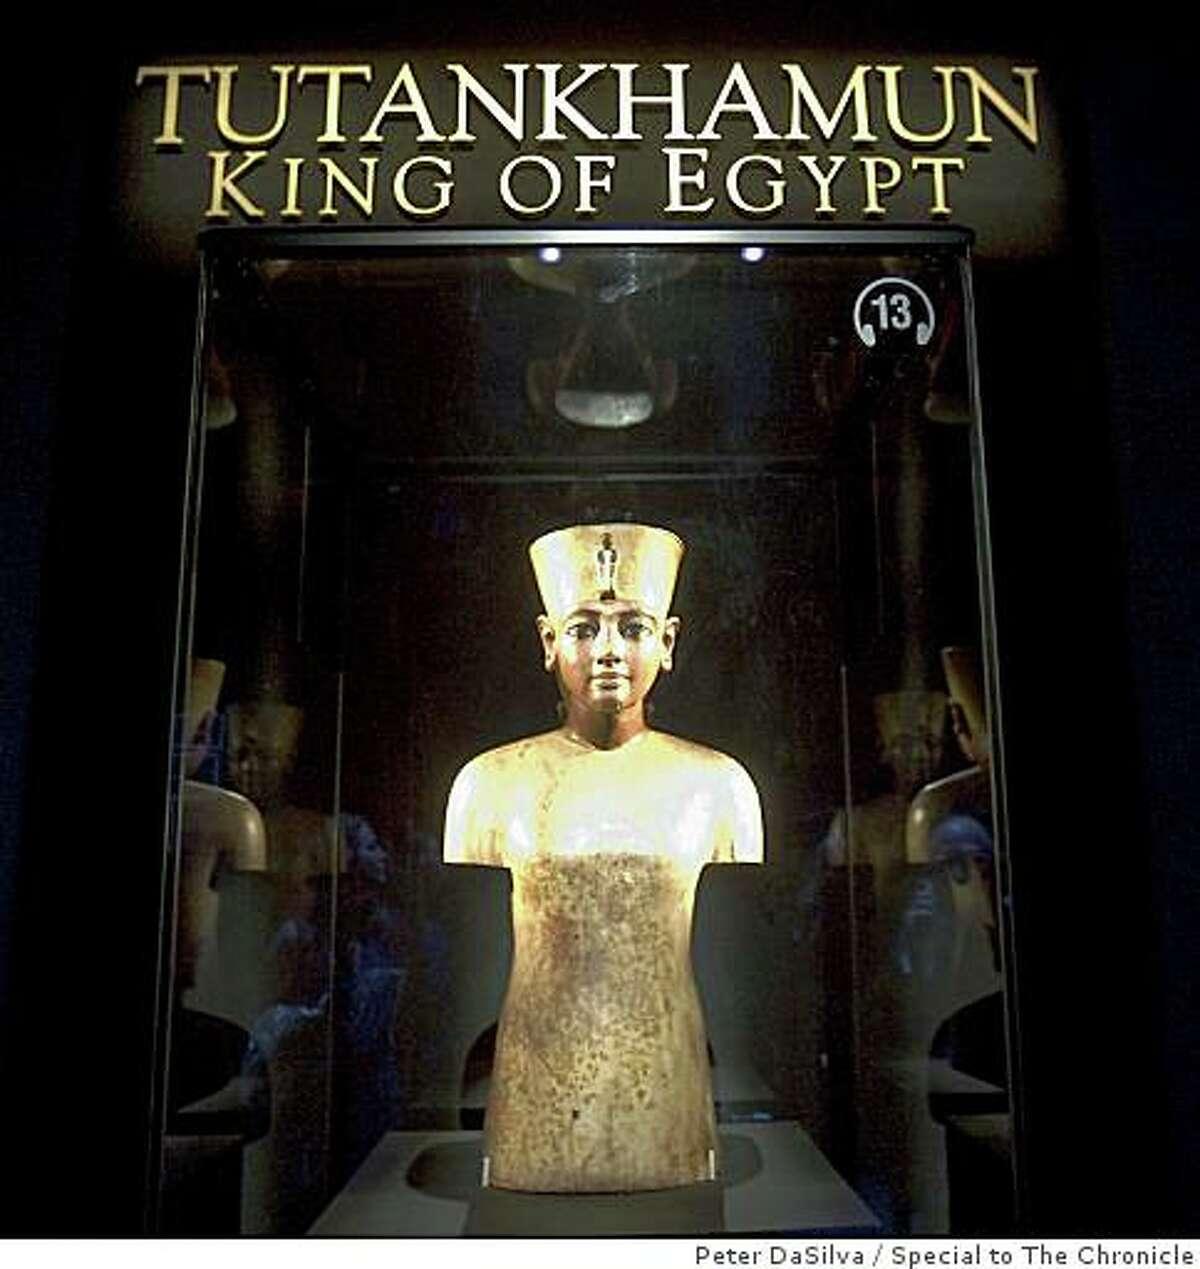 The boy king, Tutankhamun at the de Young Museum in San Francisco, California on Jun. 23, 2009.